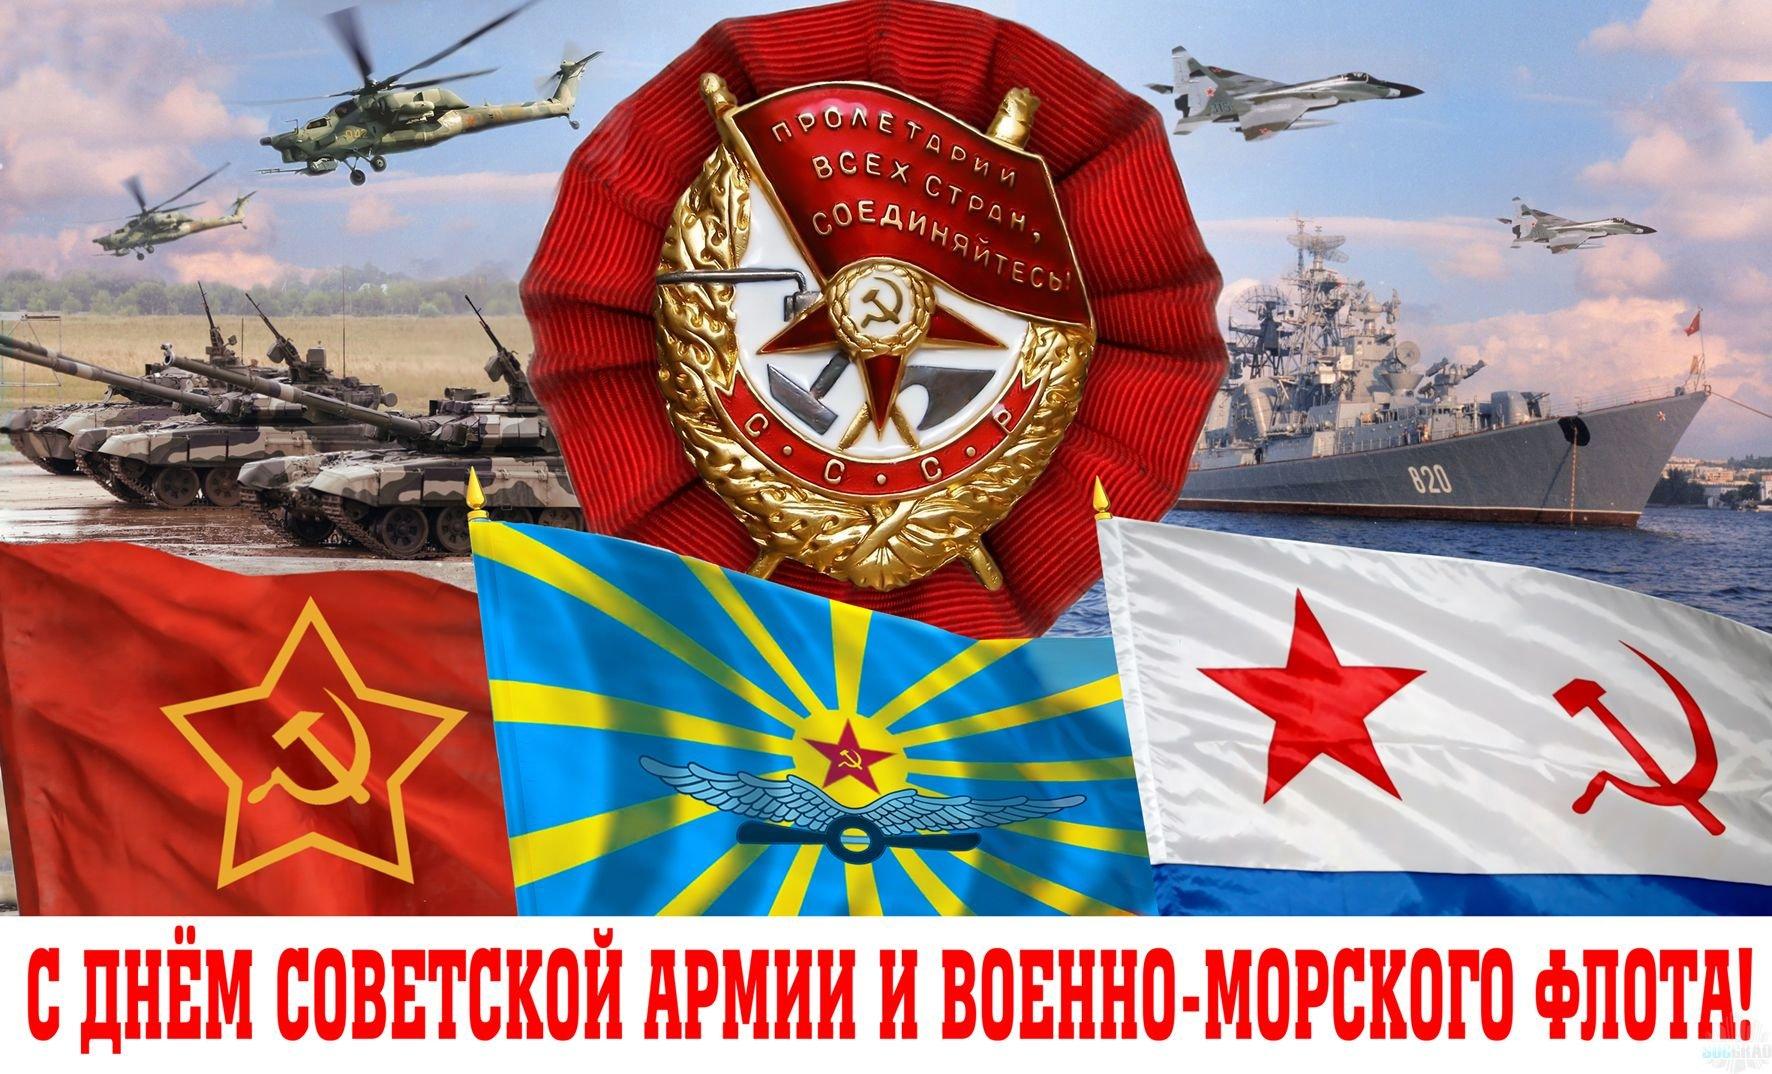 http://socgrad.ru/uploads/images/00/04/29/2014/02/23/73ee9f.jpg height=775